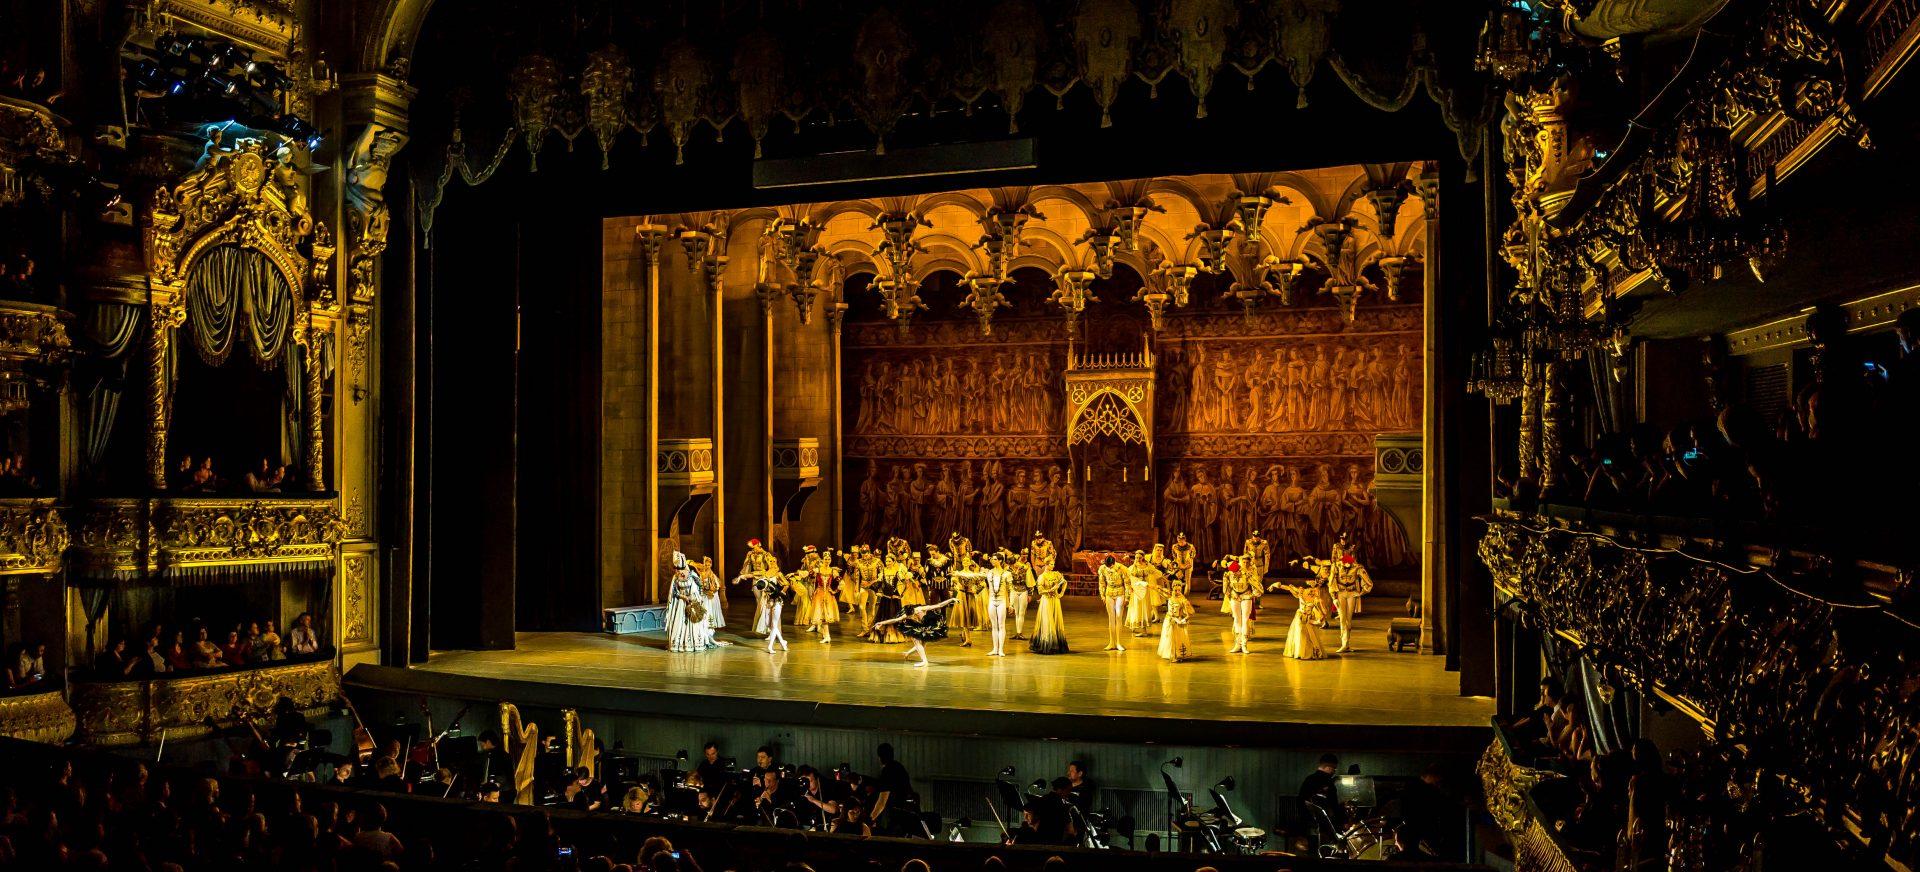 Mariinsky Theater, St. Petersburg